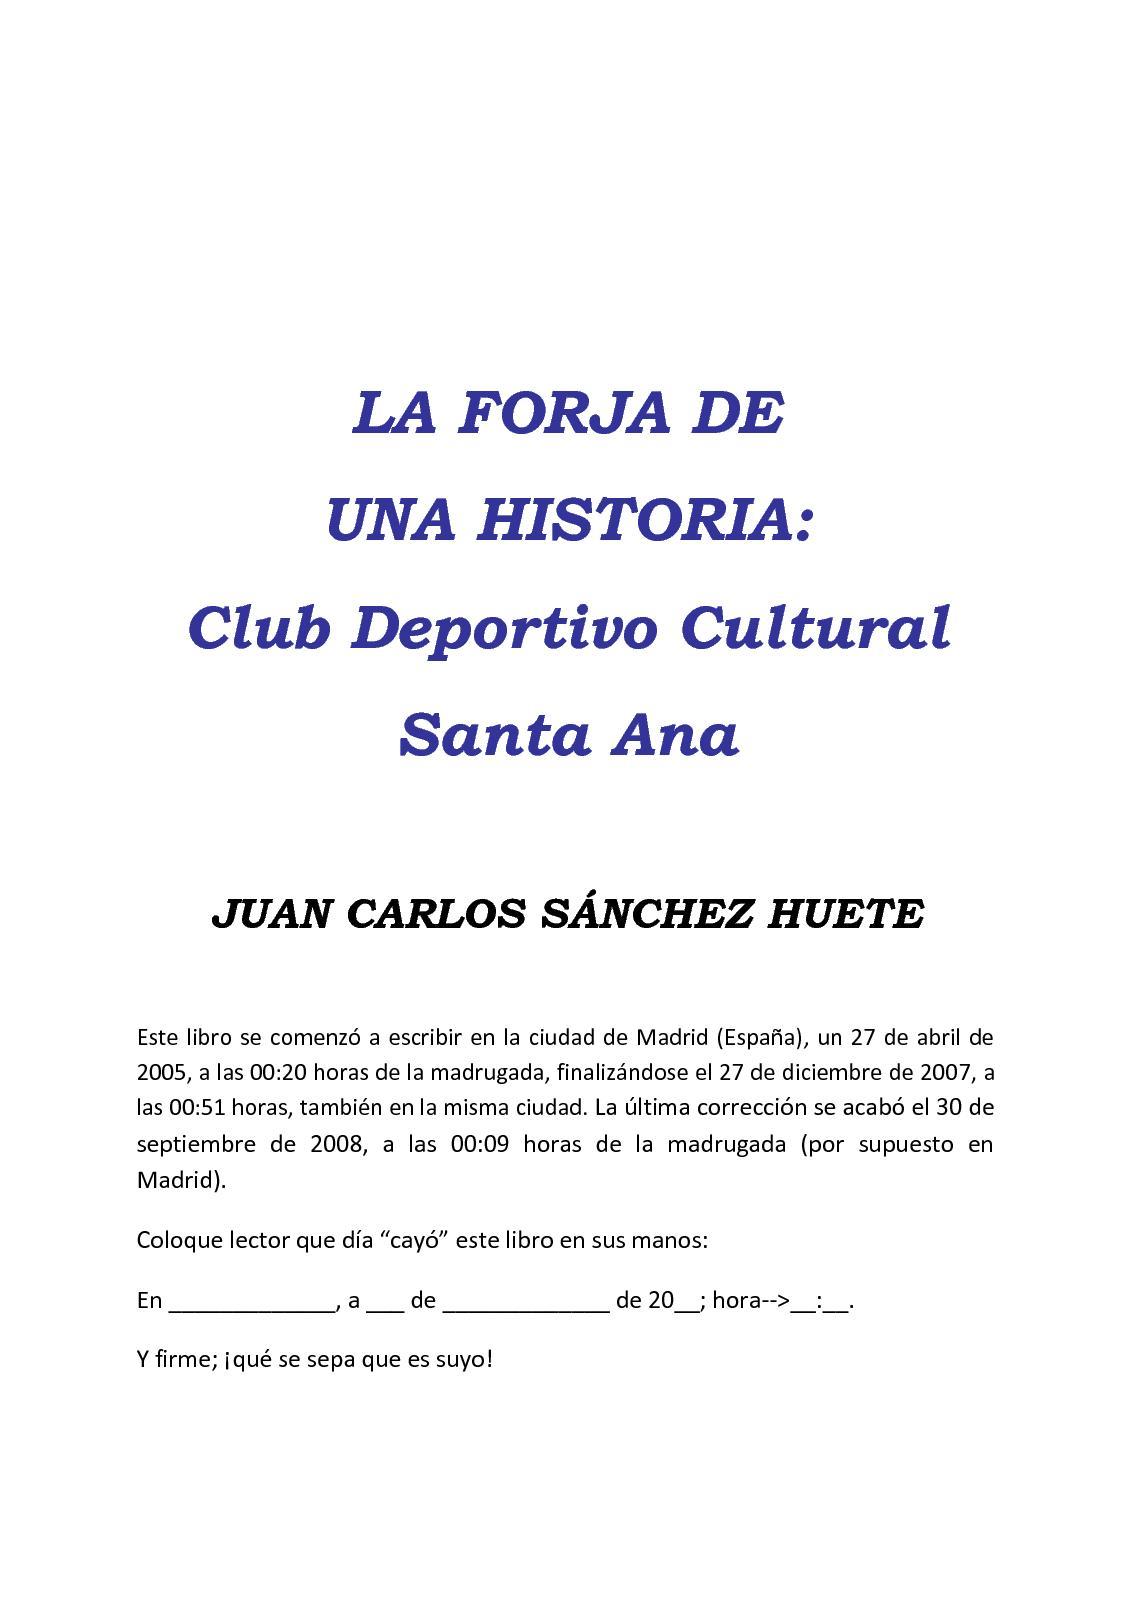 Calaméo - La Forja de una Historia: Club Deportivo Cultural Santa Ana